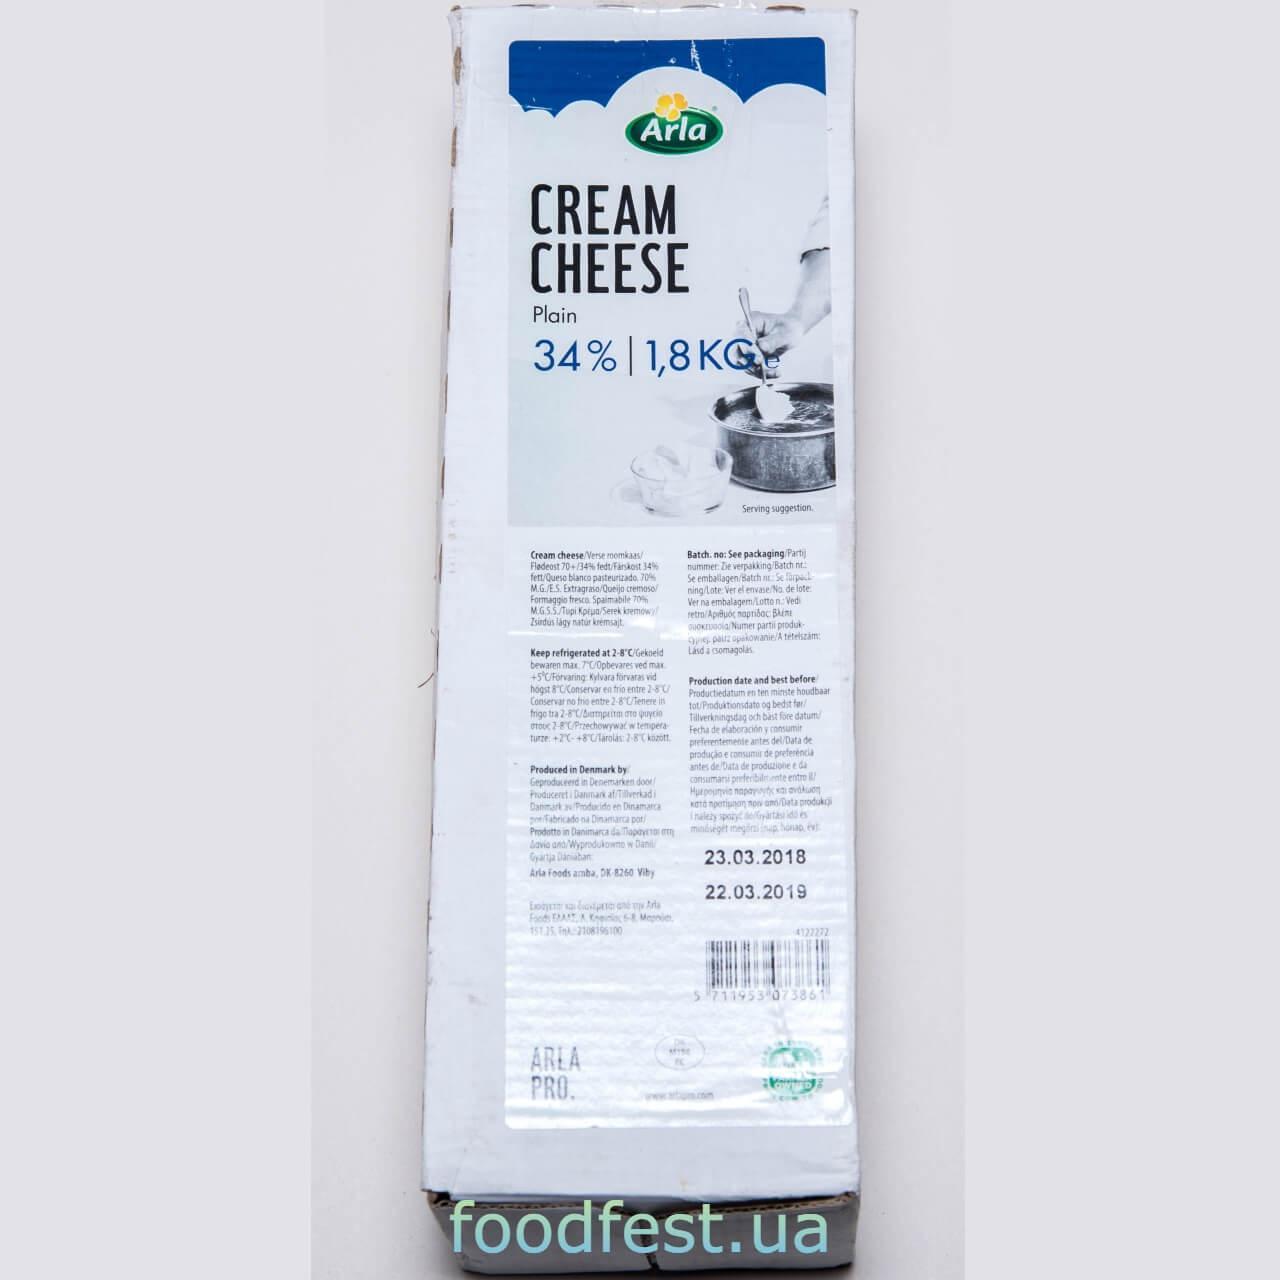 Крем-сир Буко TM Arla 1,8 кг